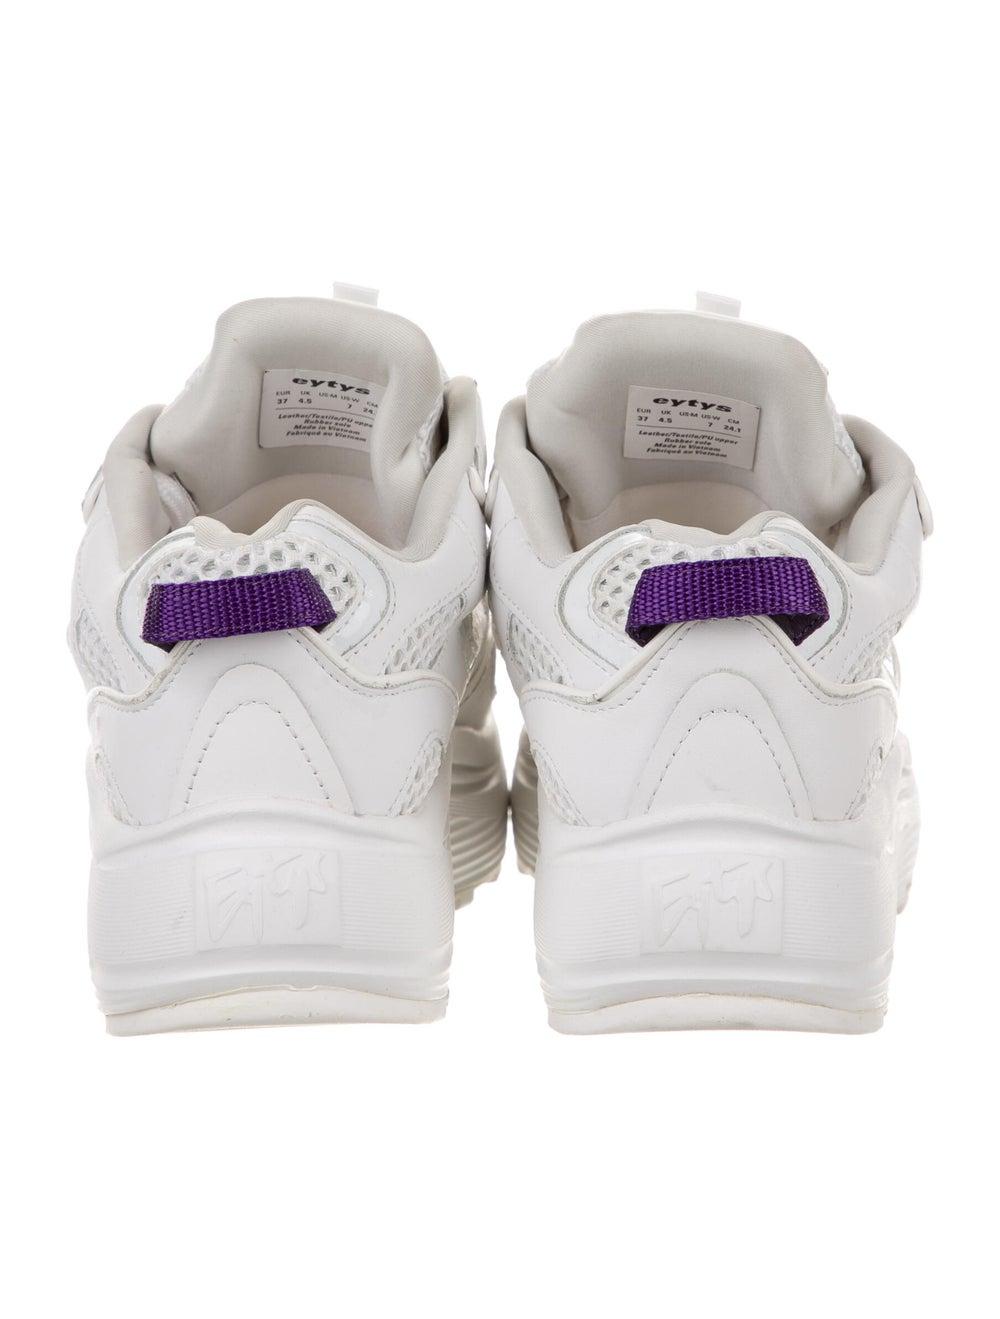 Eytys Snow Sneakers White - image 4